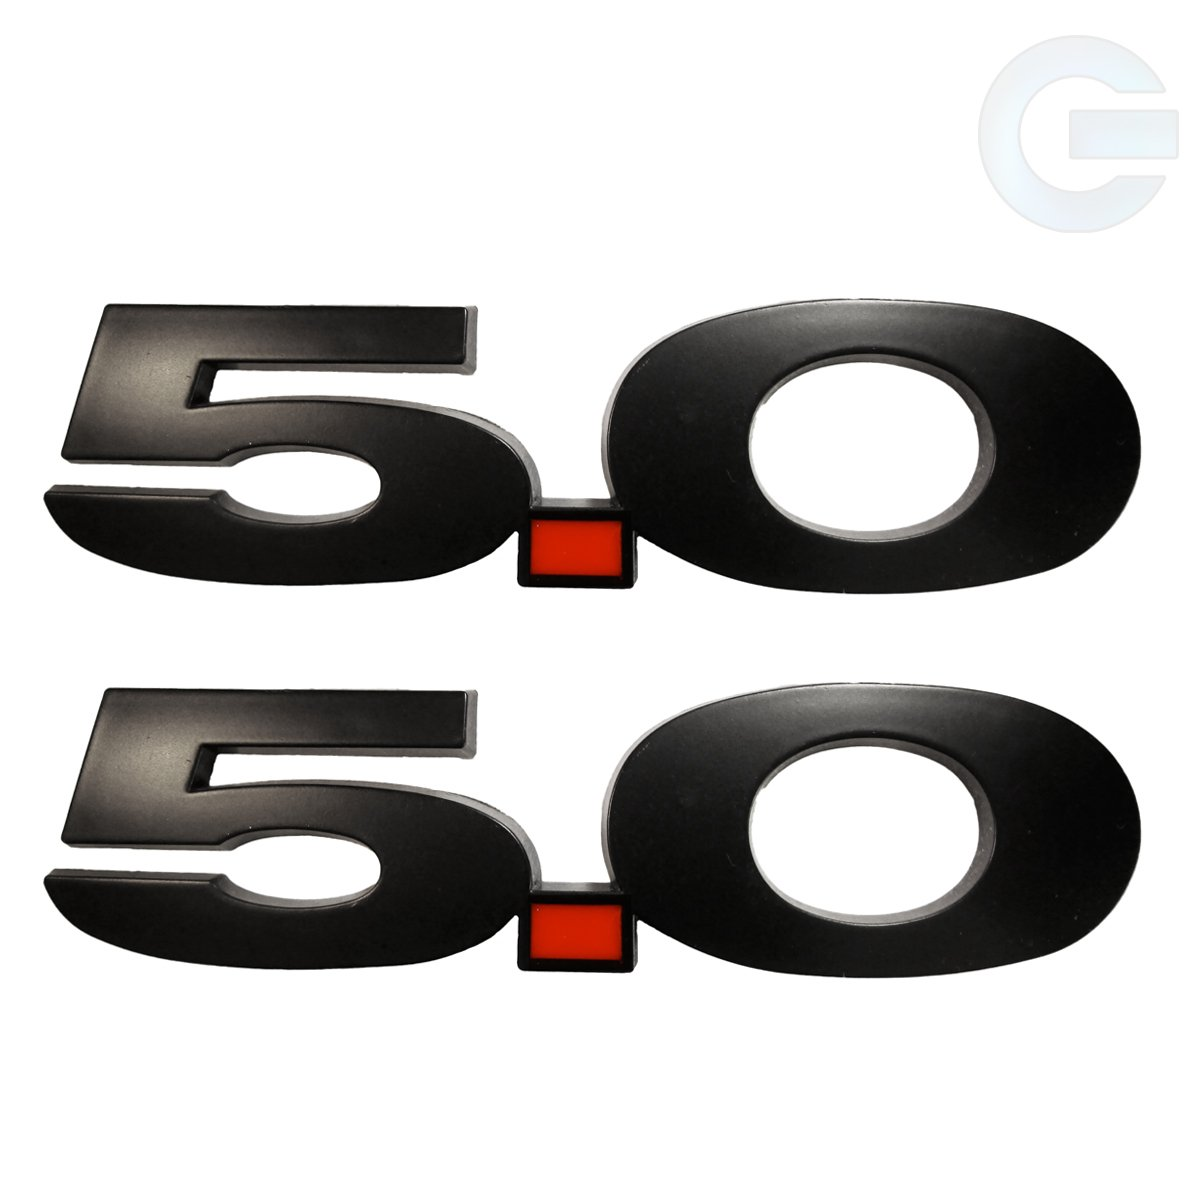 5.0 Liter Matte Black Emblems Ford Mustang F150 - Pair